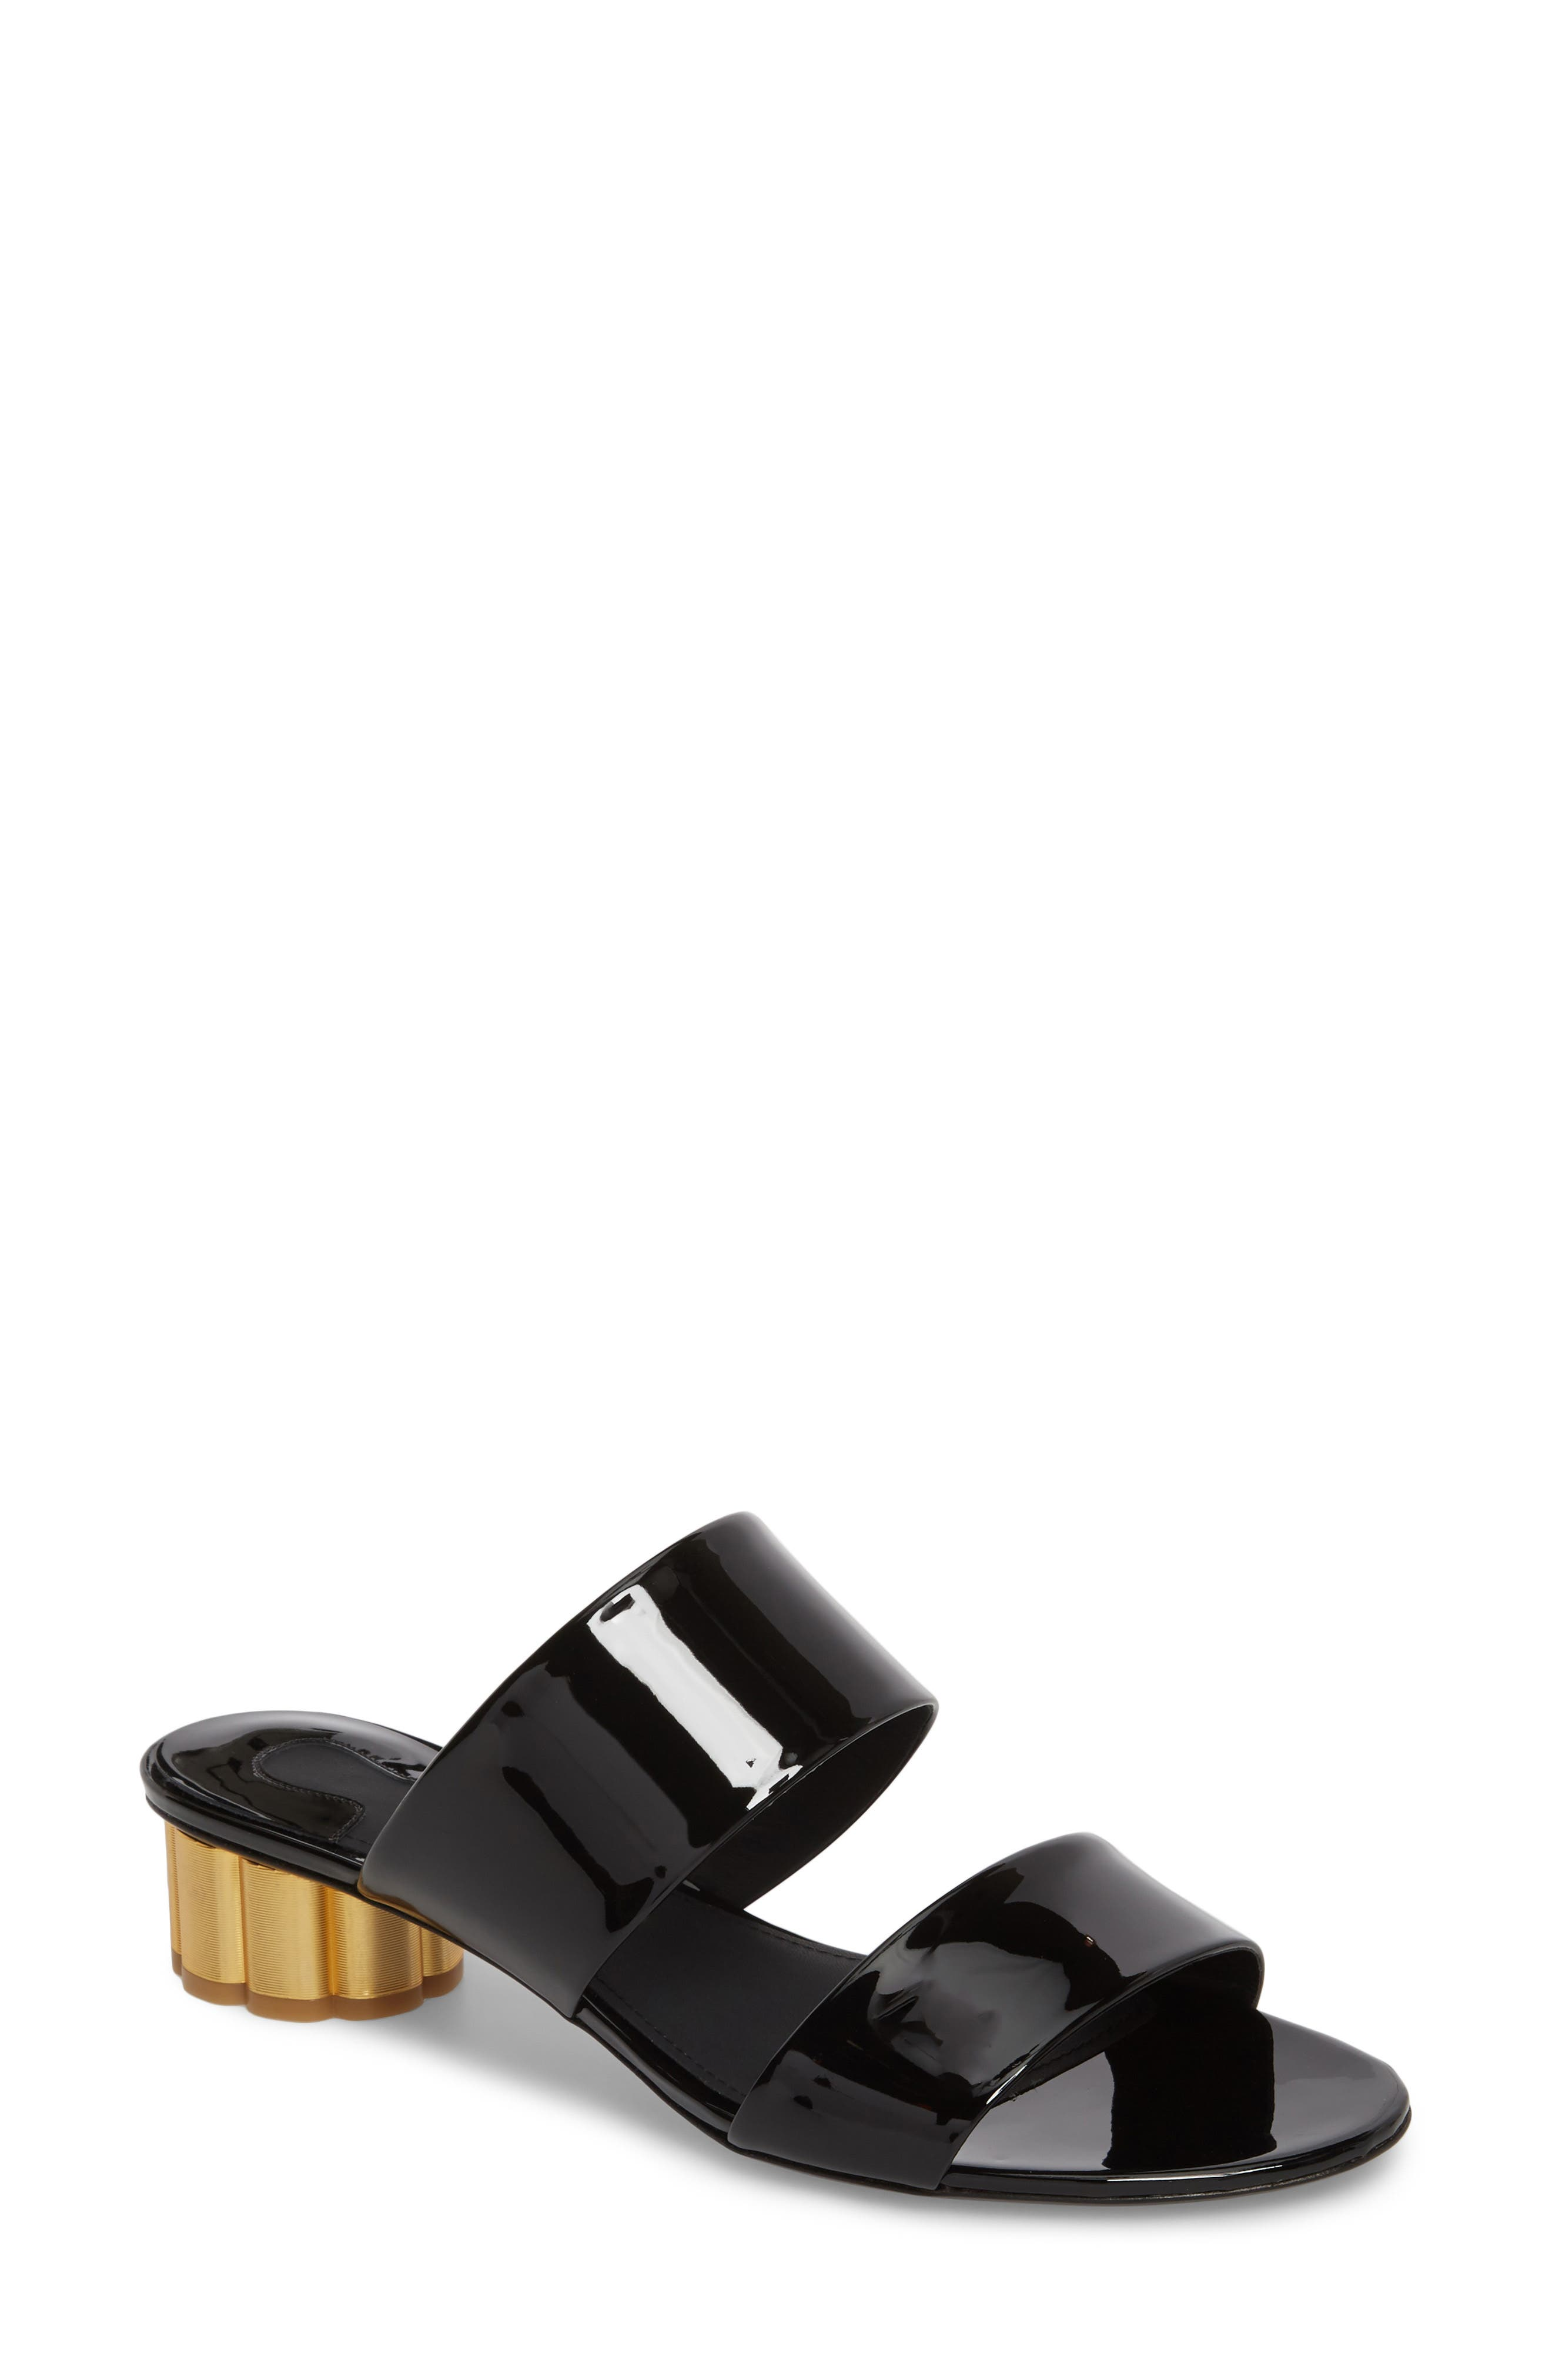 SALVATORE FERRAGAMO,                             Belluno Double Band Slide Sandal,                             Main thumbnail 1, color,                             BLACK PATENT LEATHER